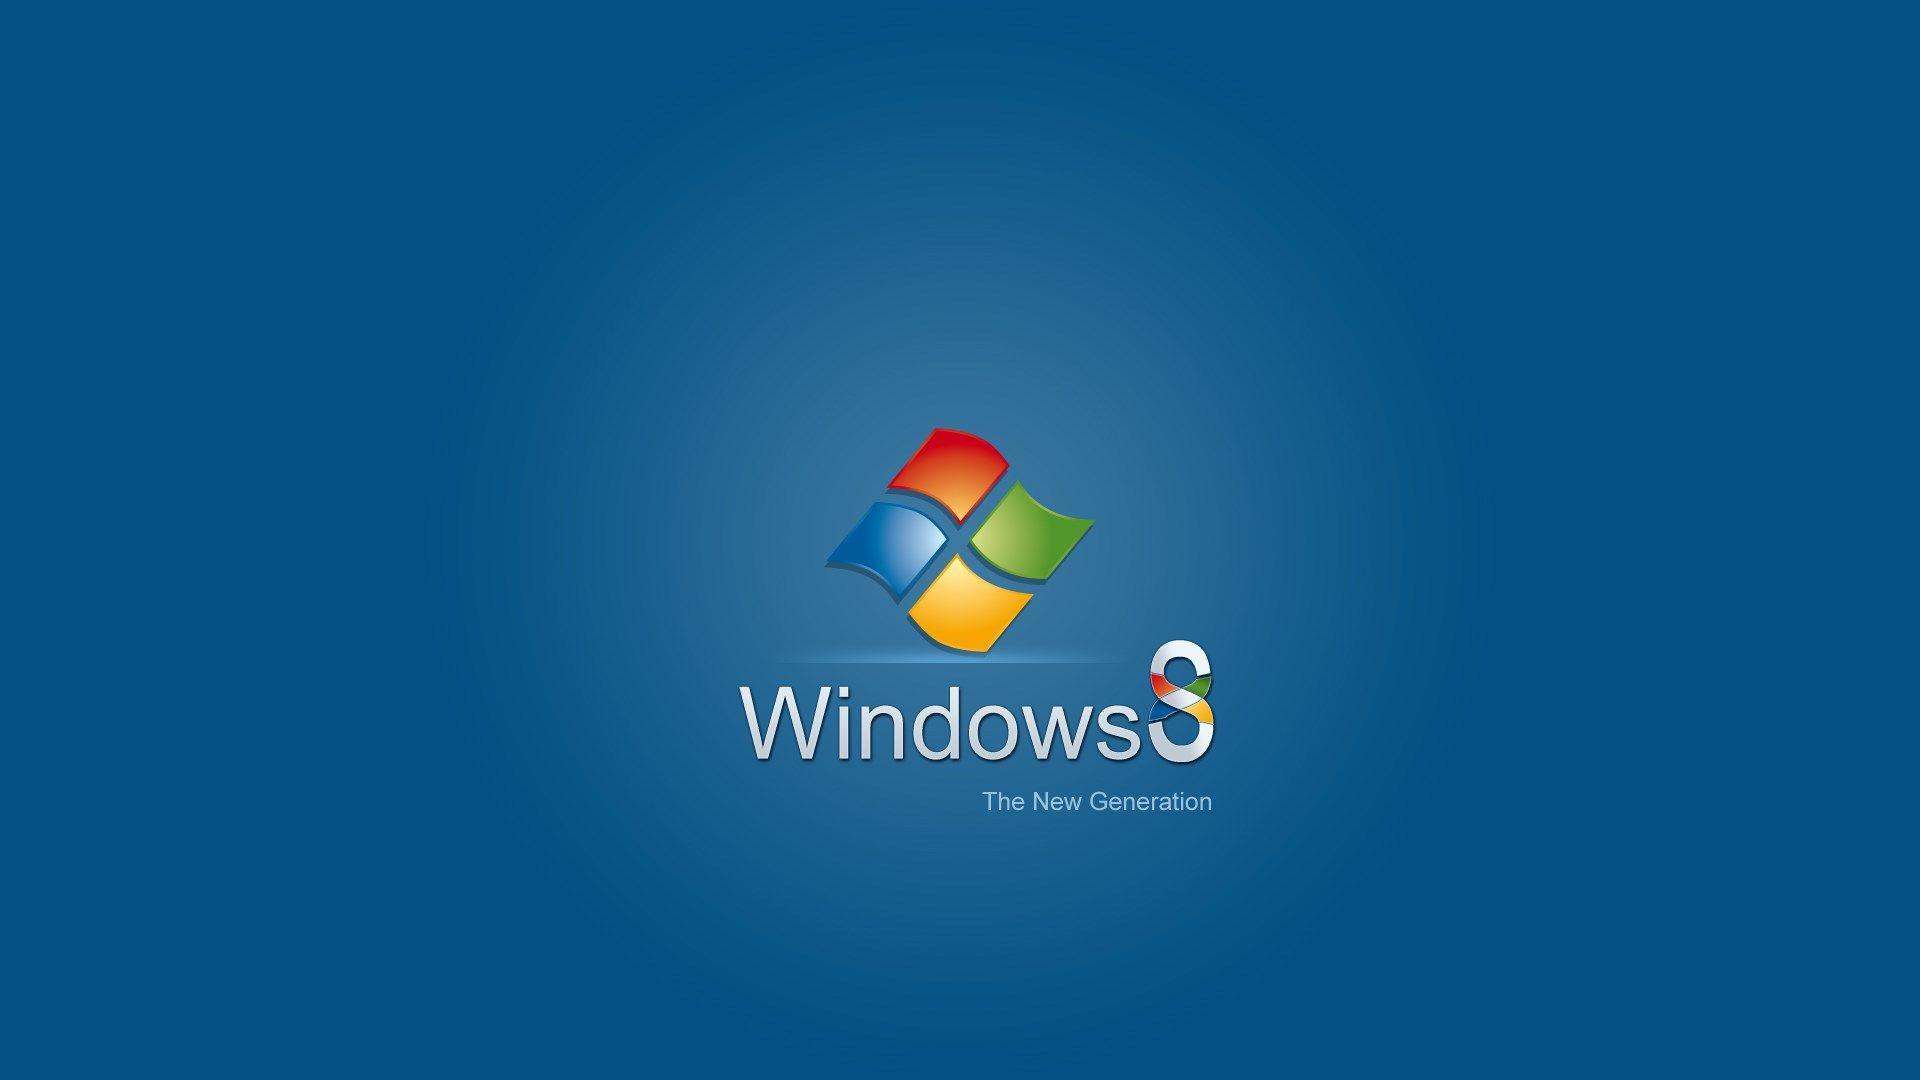 1920x1080px Windows 8 Theme Picture By Nakisha Robertson